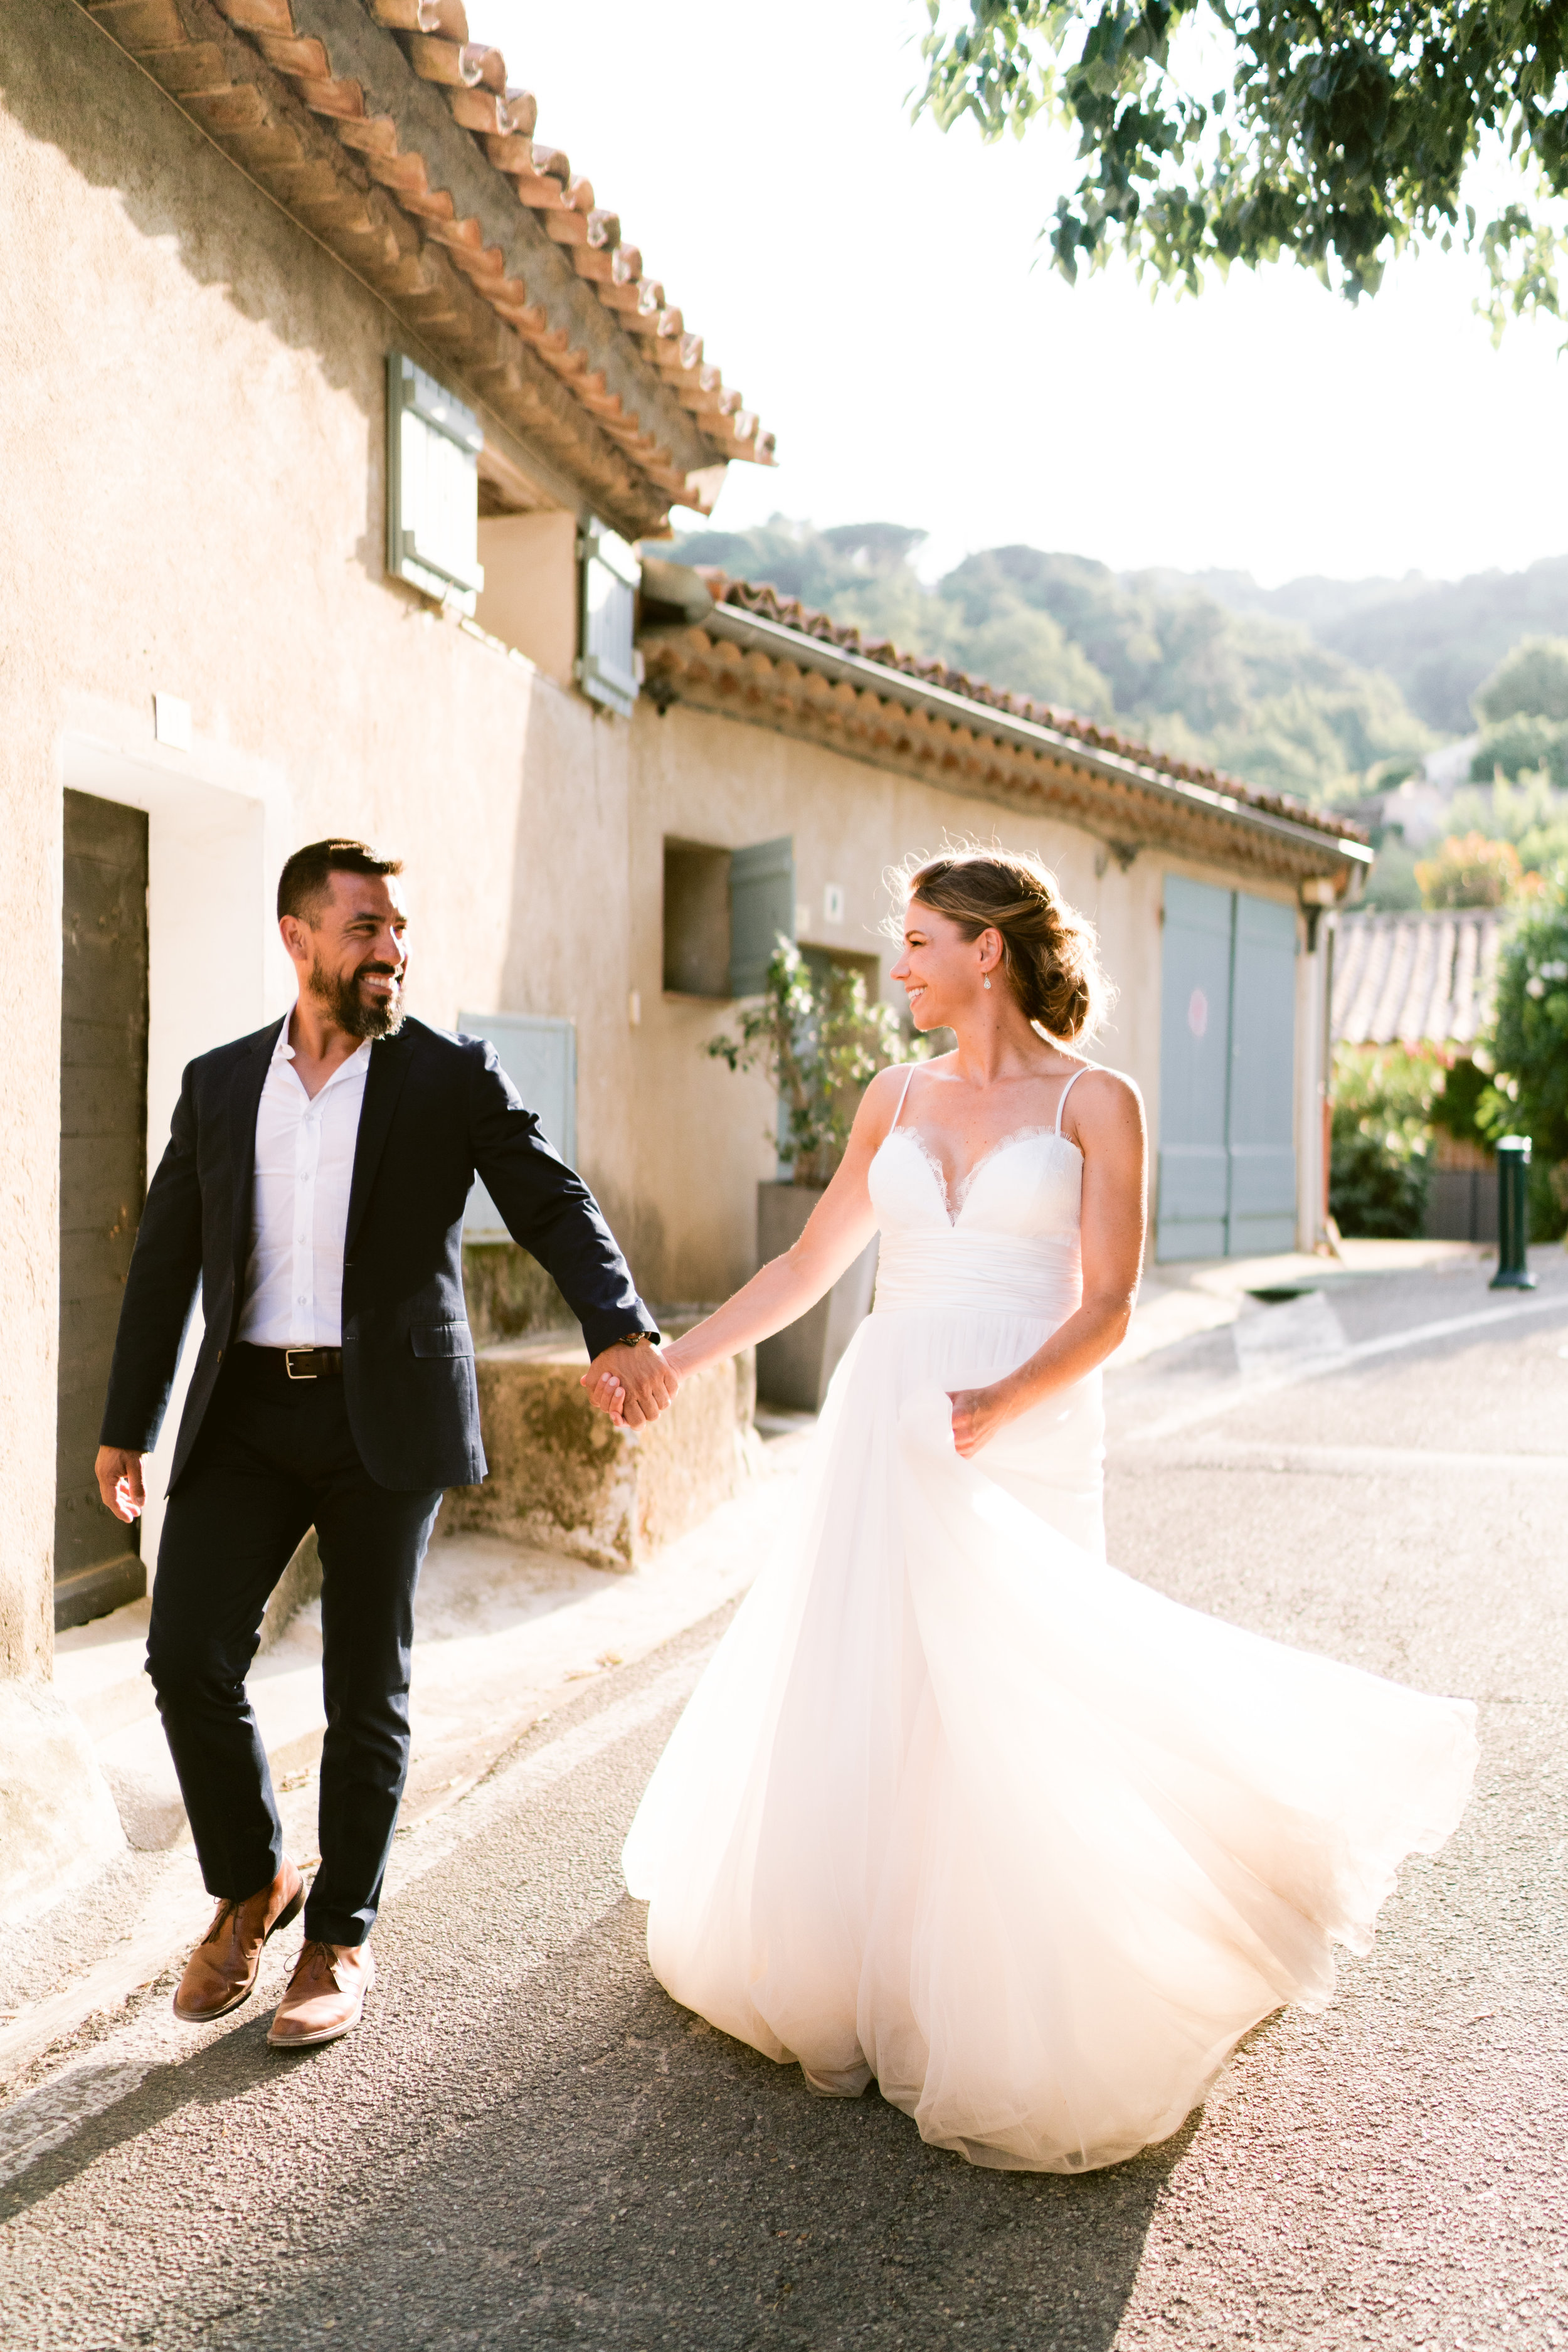 english photographer in france, wedding photographer saint tropez, romantic wedding photography france, chateau wedding france, cote d'azur wedding photographer, ramatuelle wedding (8).jpg